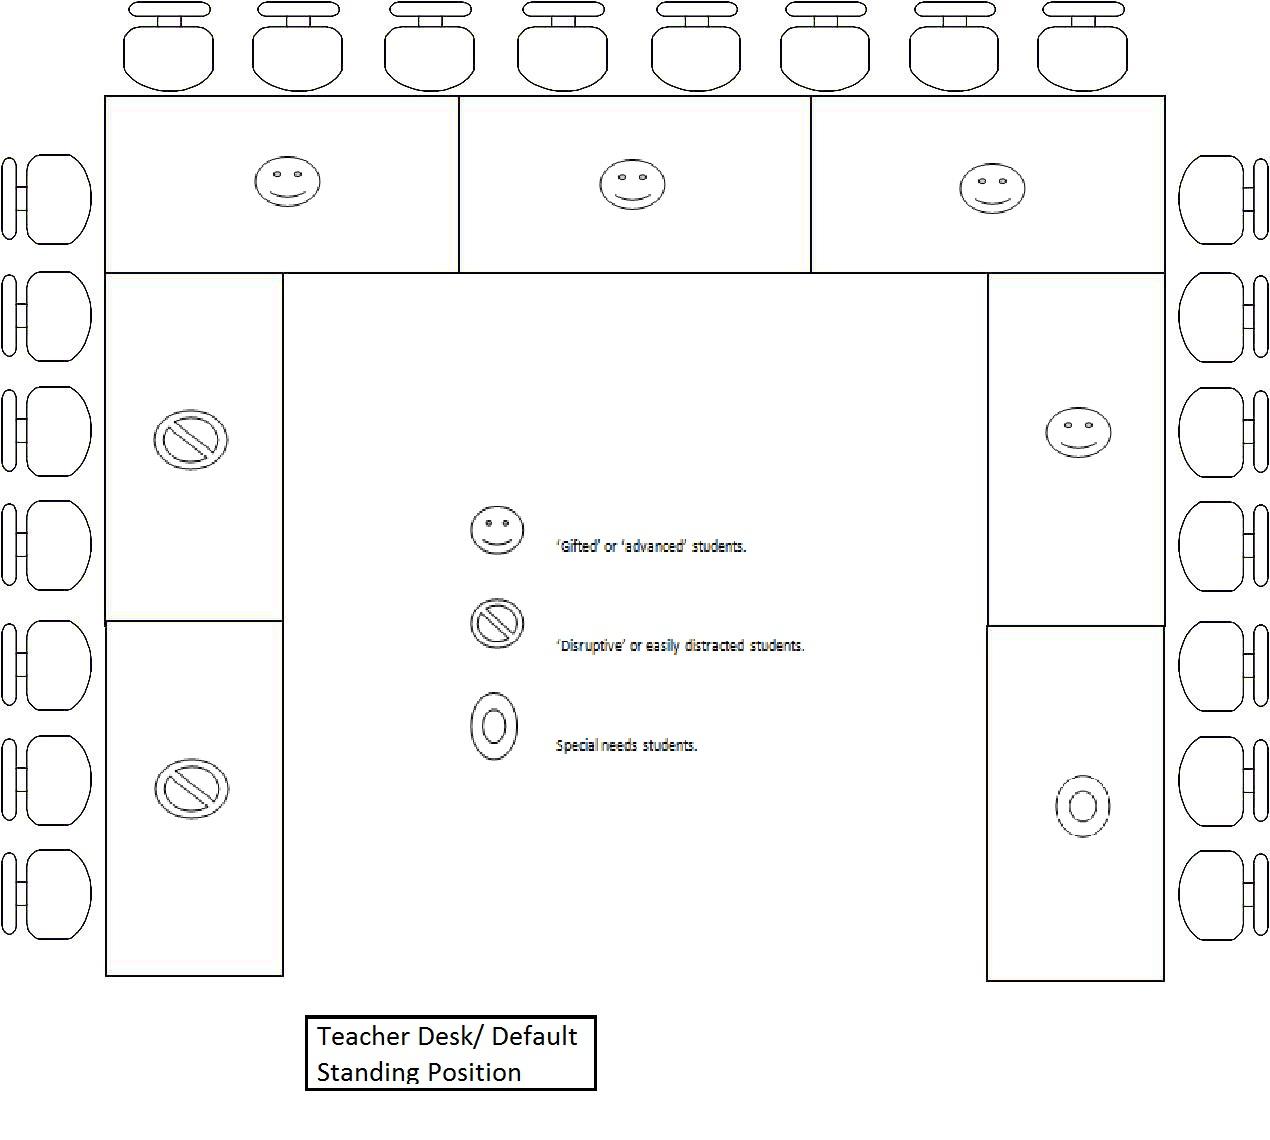 Z Arrangement Classroom Design Definition ~ Edss reign of terror in france classroom management plan